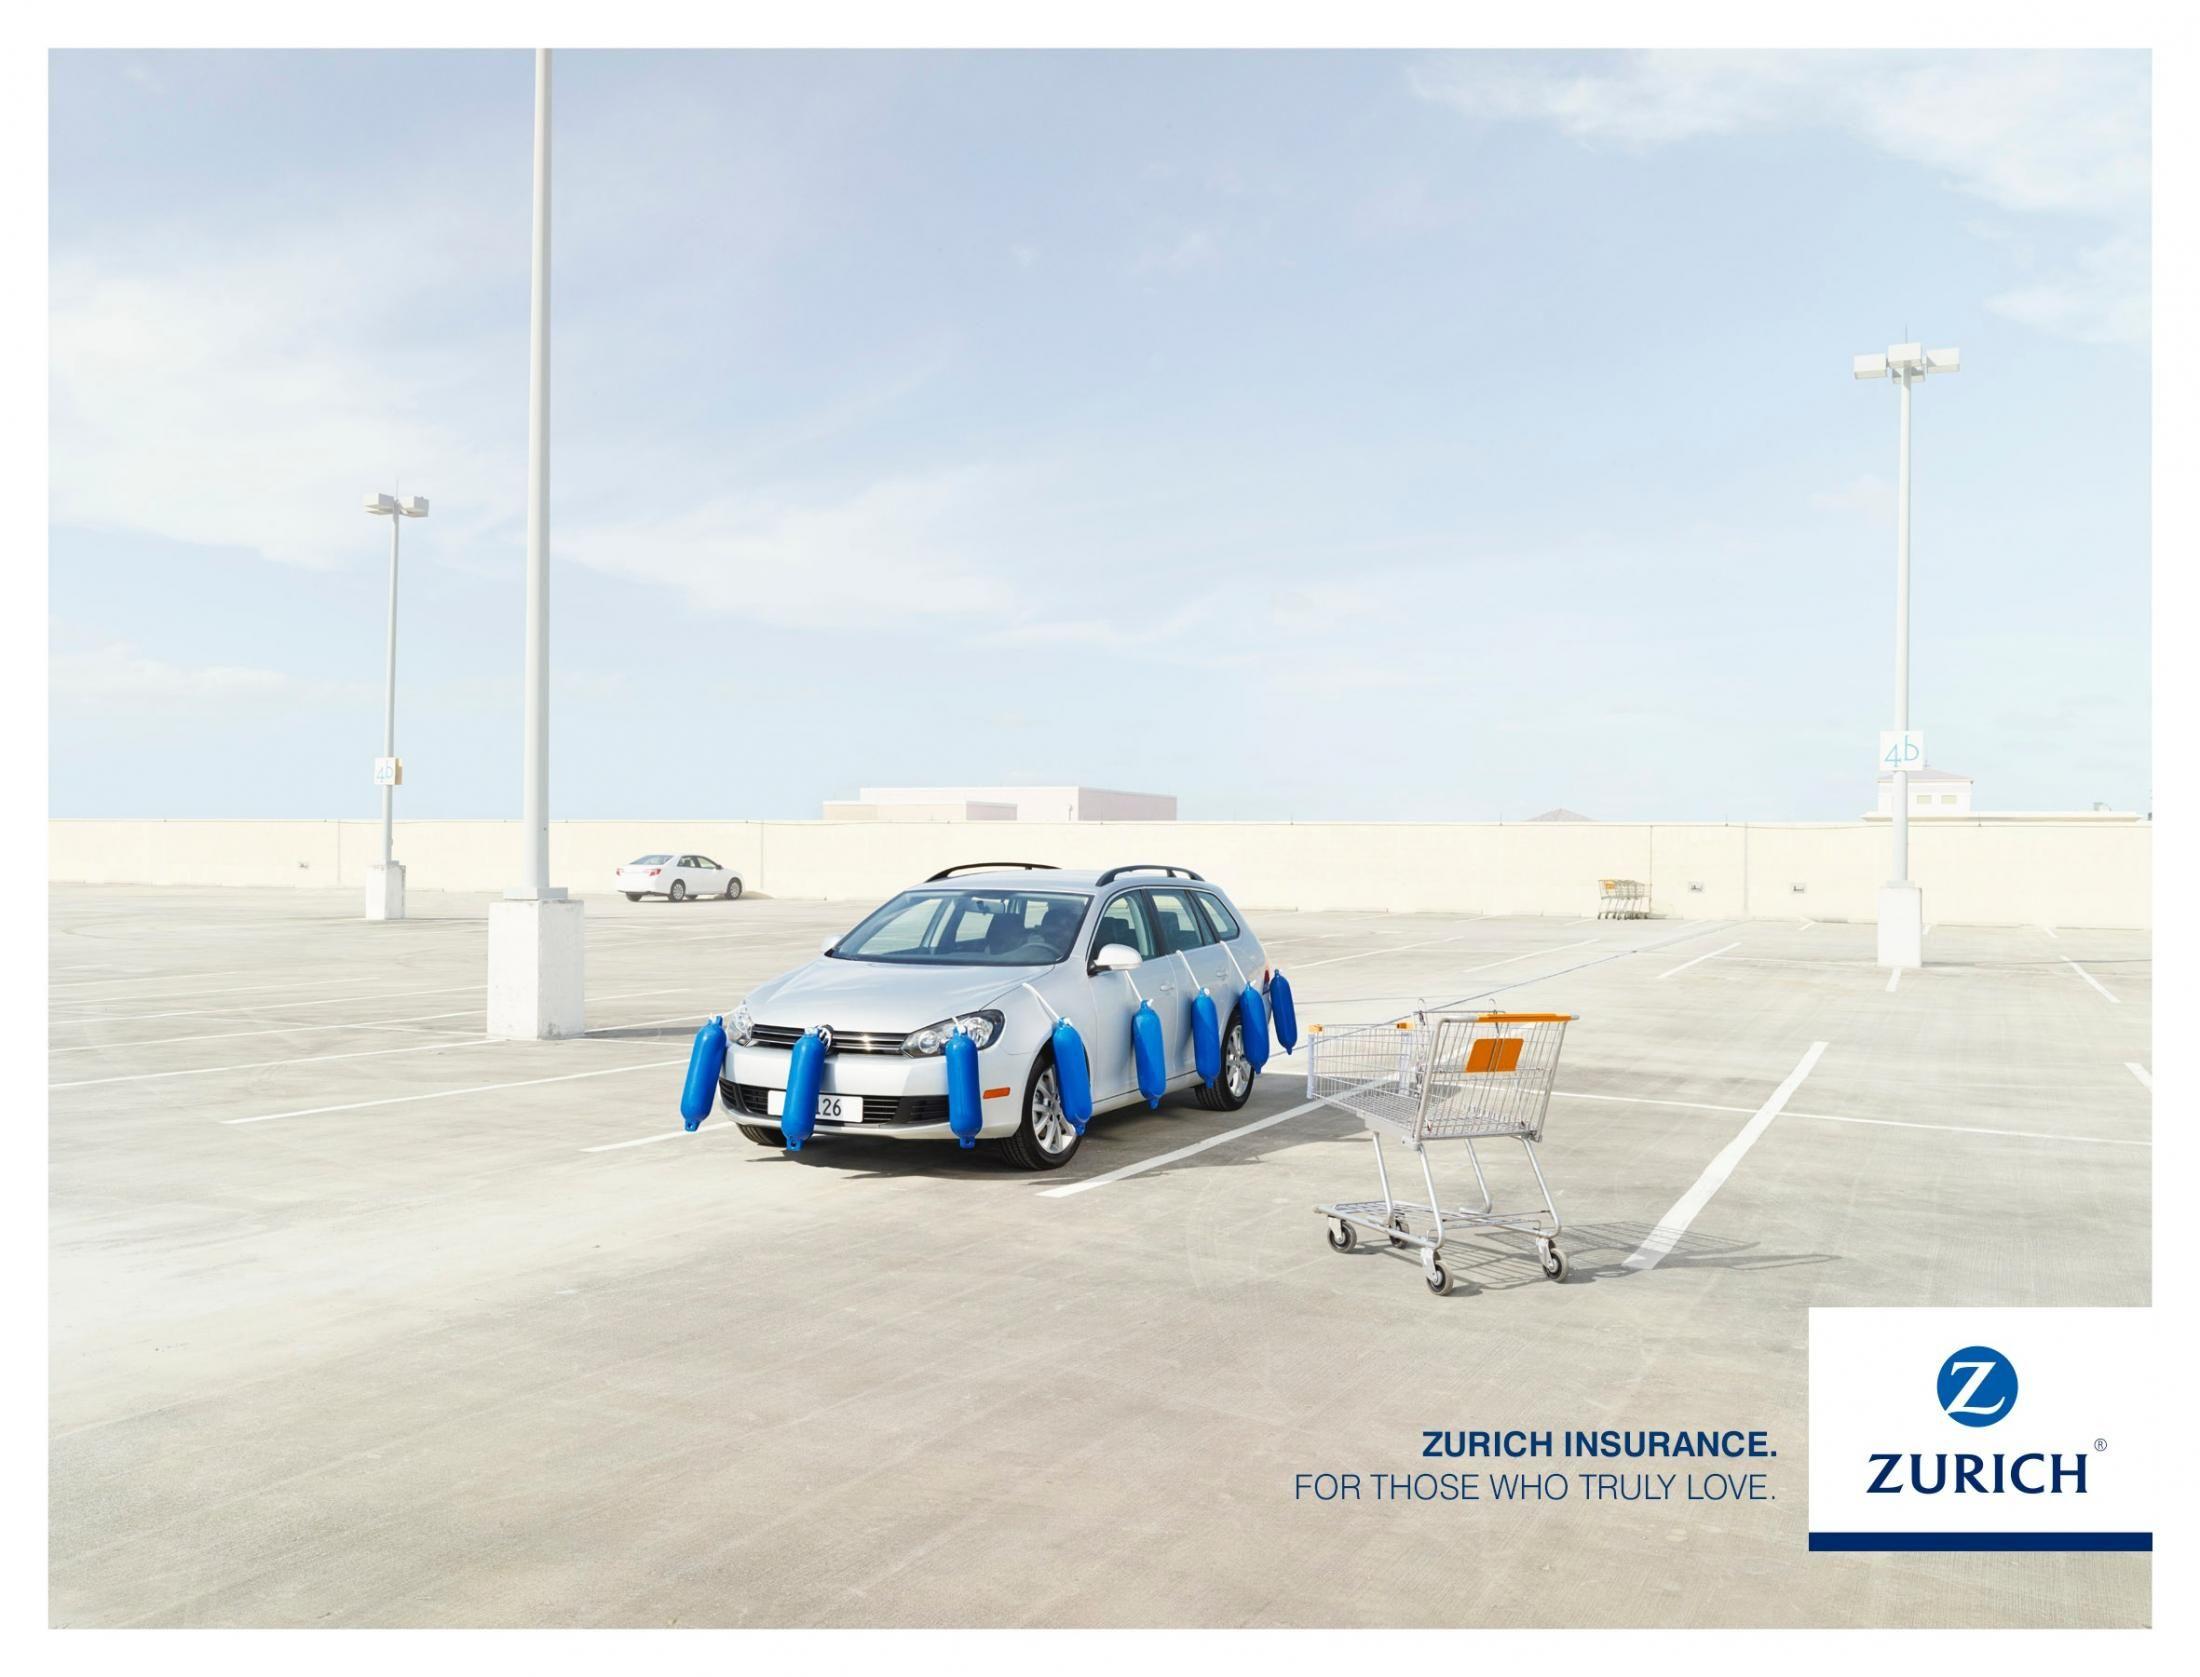 Zurich Car Protection Zurich Car Protection Ad Of The World